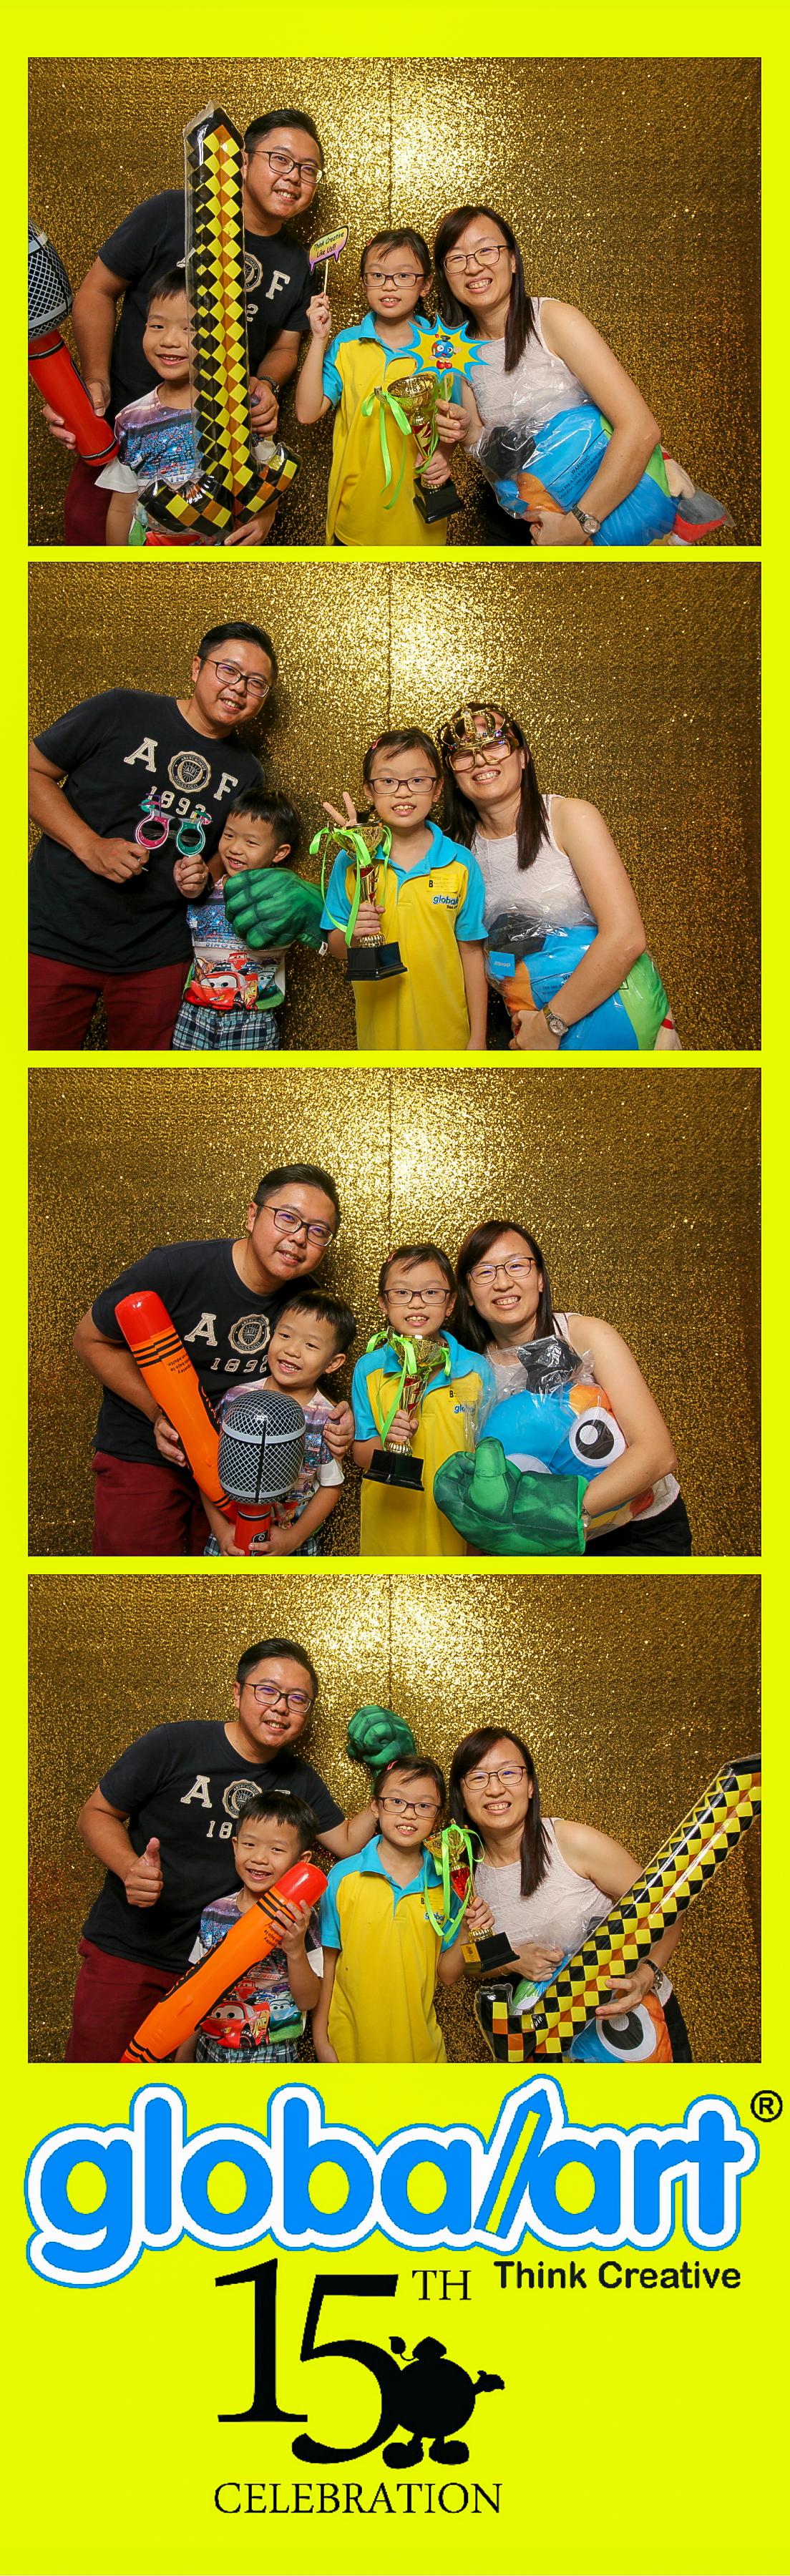 global art photo booth singapore (56)